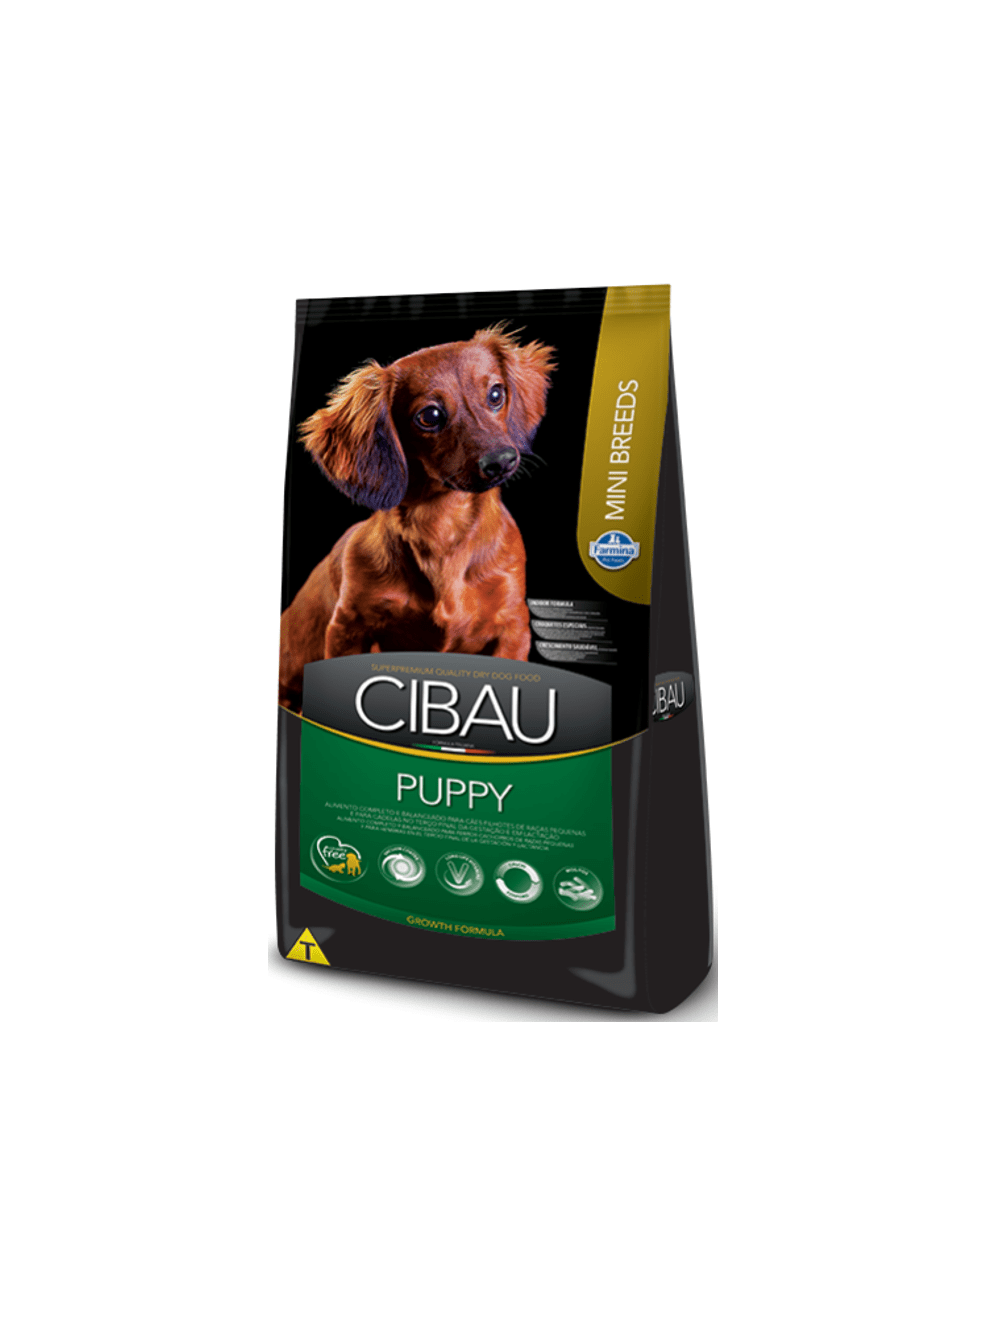 Cibau Puppy Mini Breed 1KG - Ciudaddemascotas.com